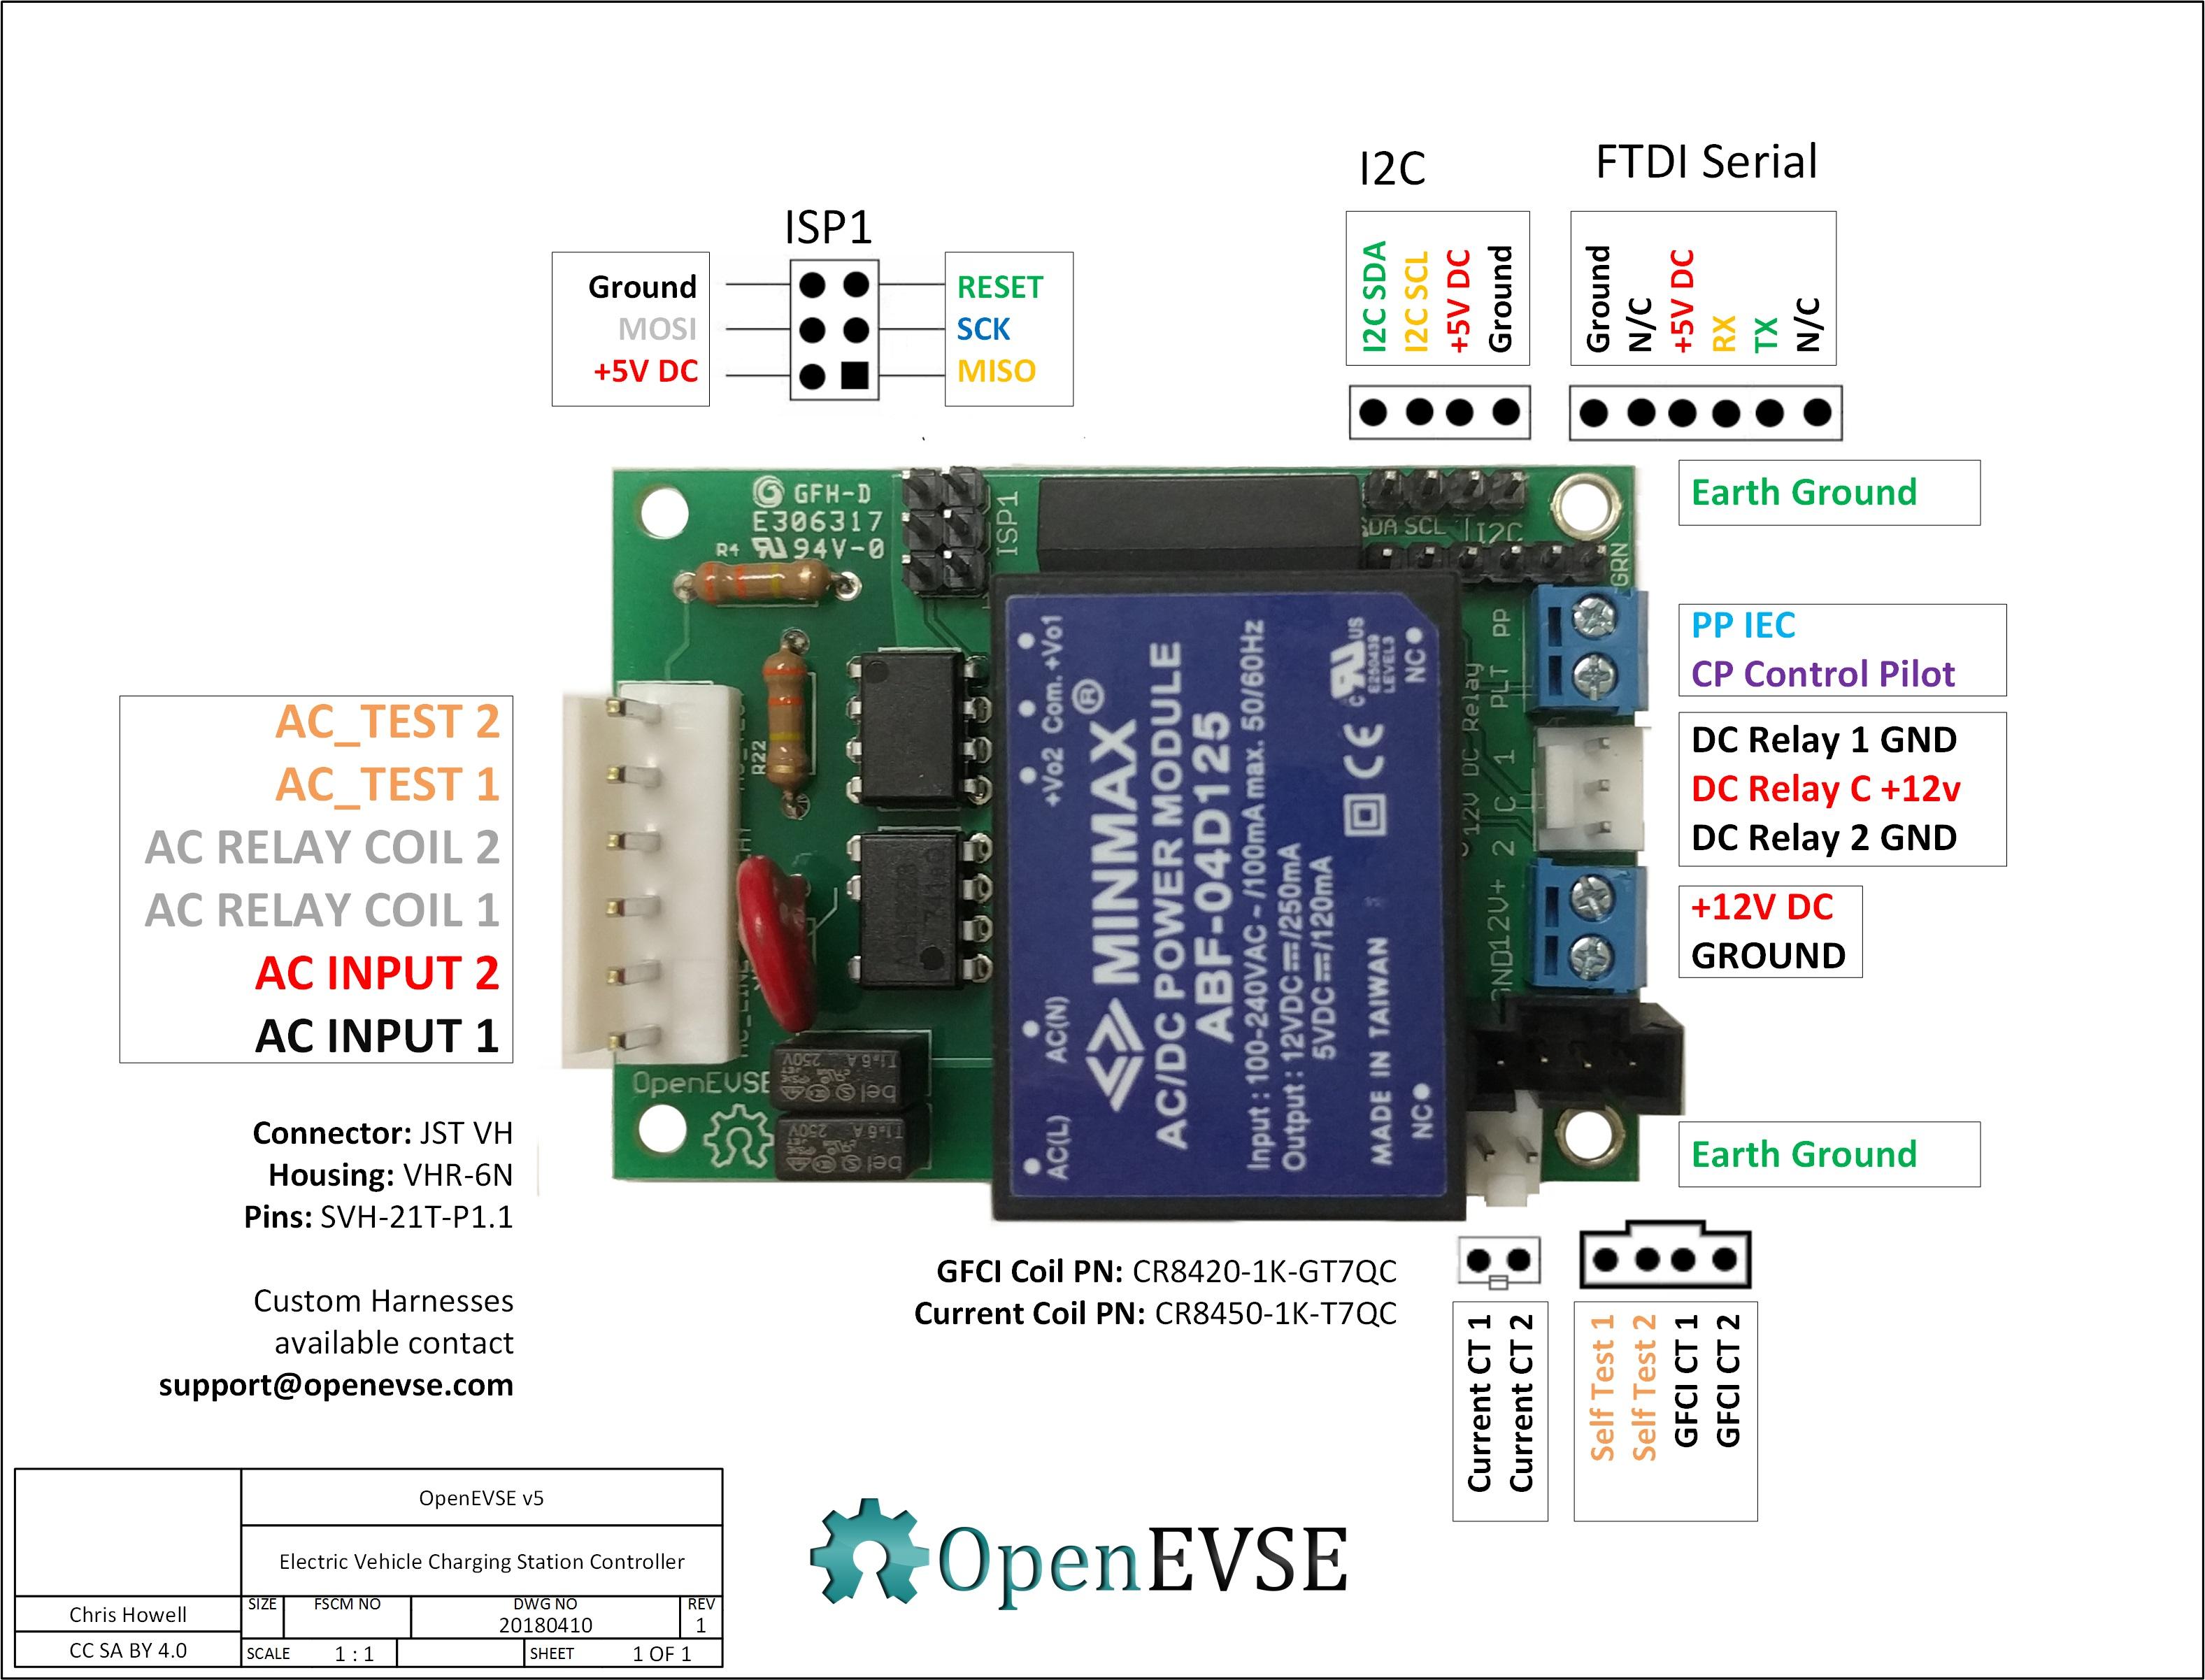 OpenEVSE Electric Vehicle controller v5 SAE J1772 IEC 61851